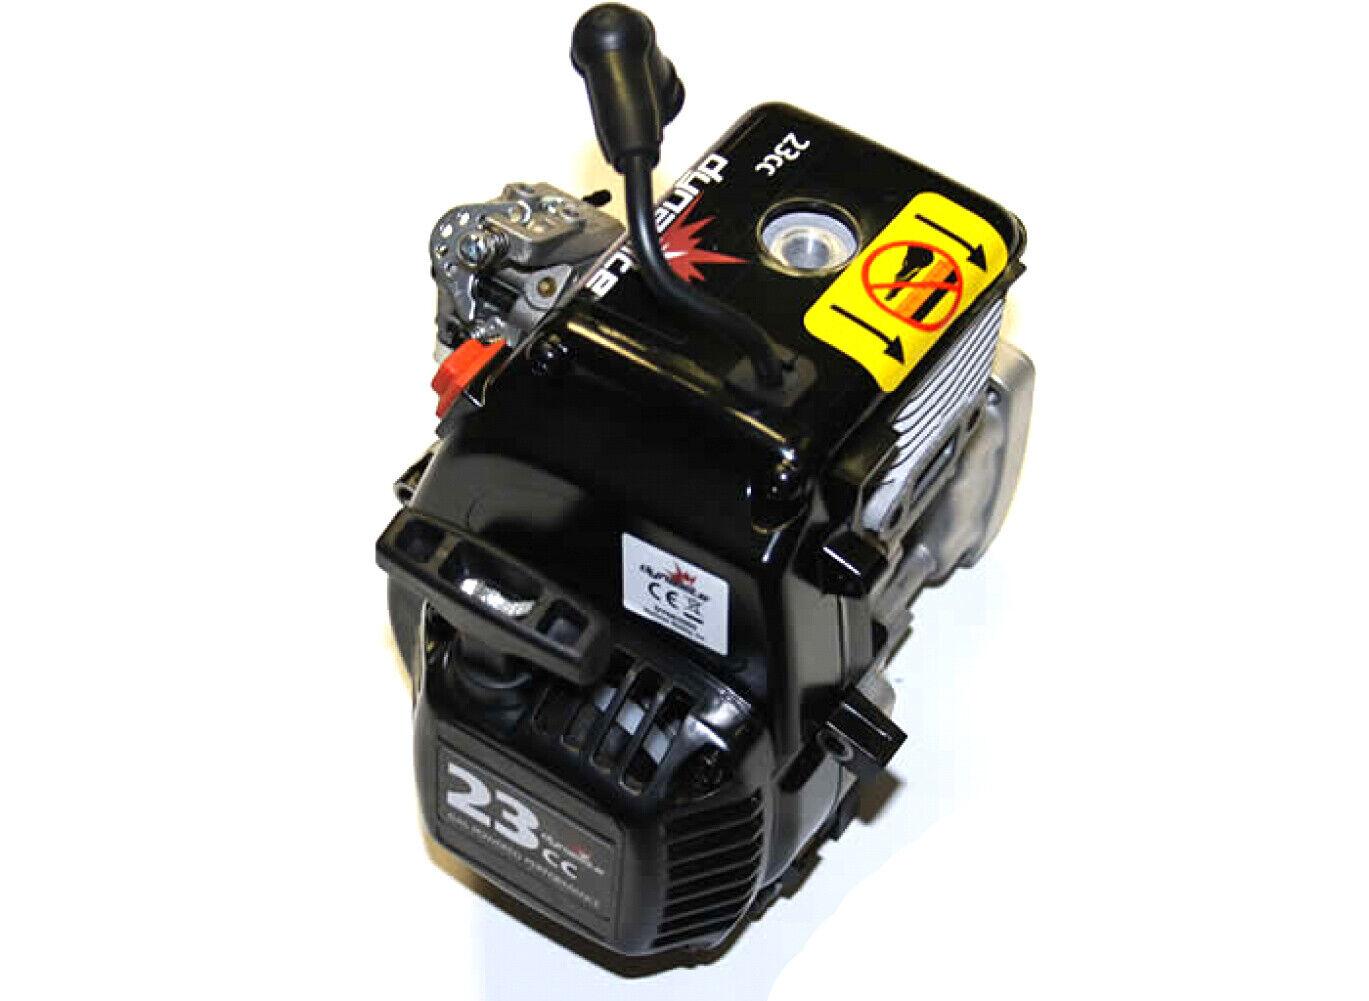 Losi cy23cc 23ccm motor chung yang sets con arranque manual nuevo l5b ®